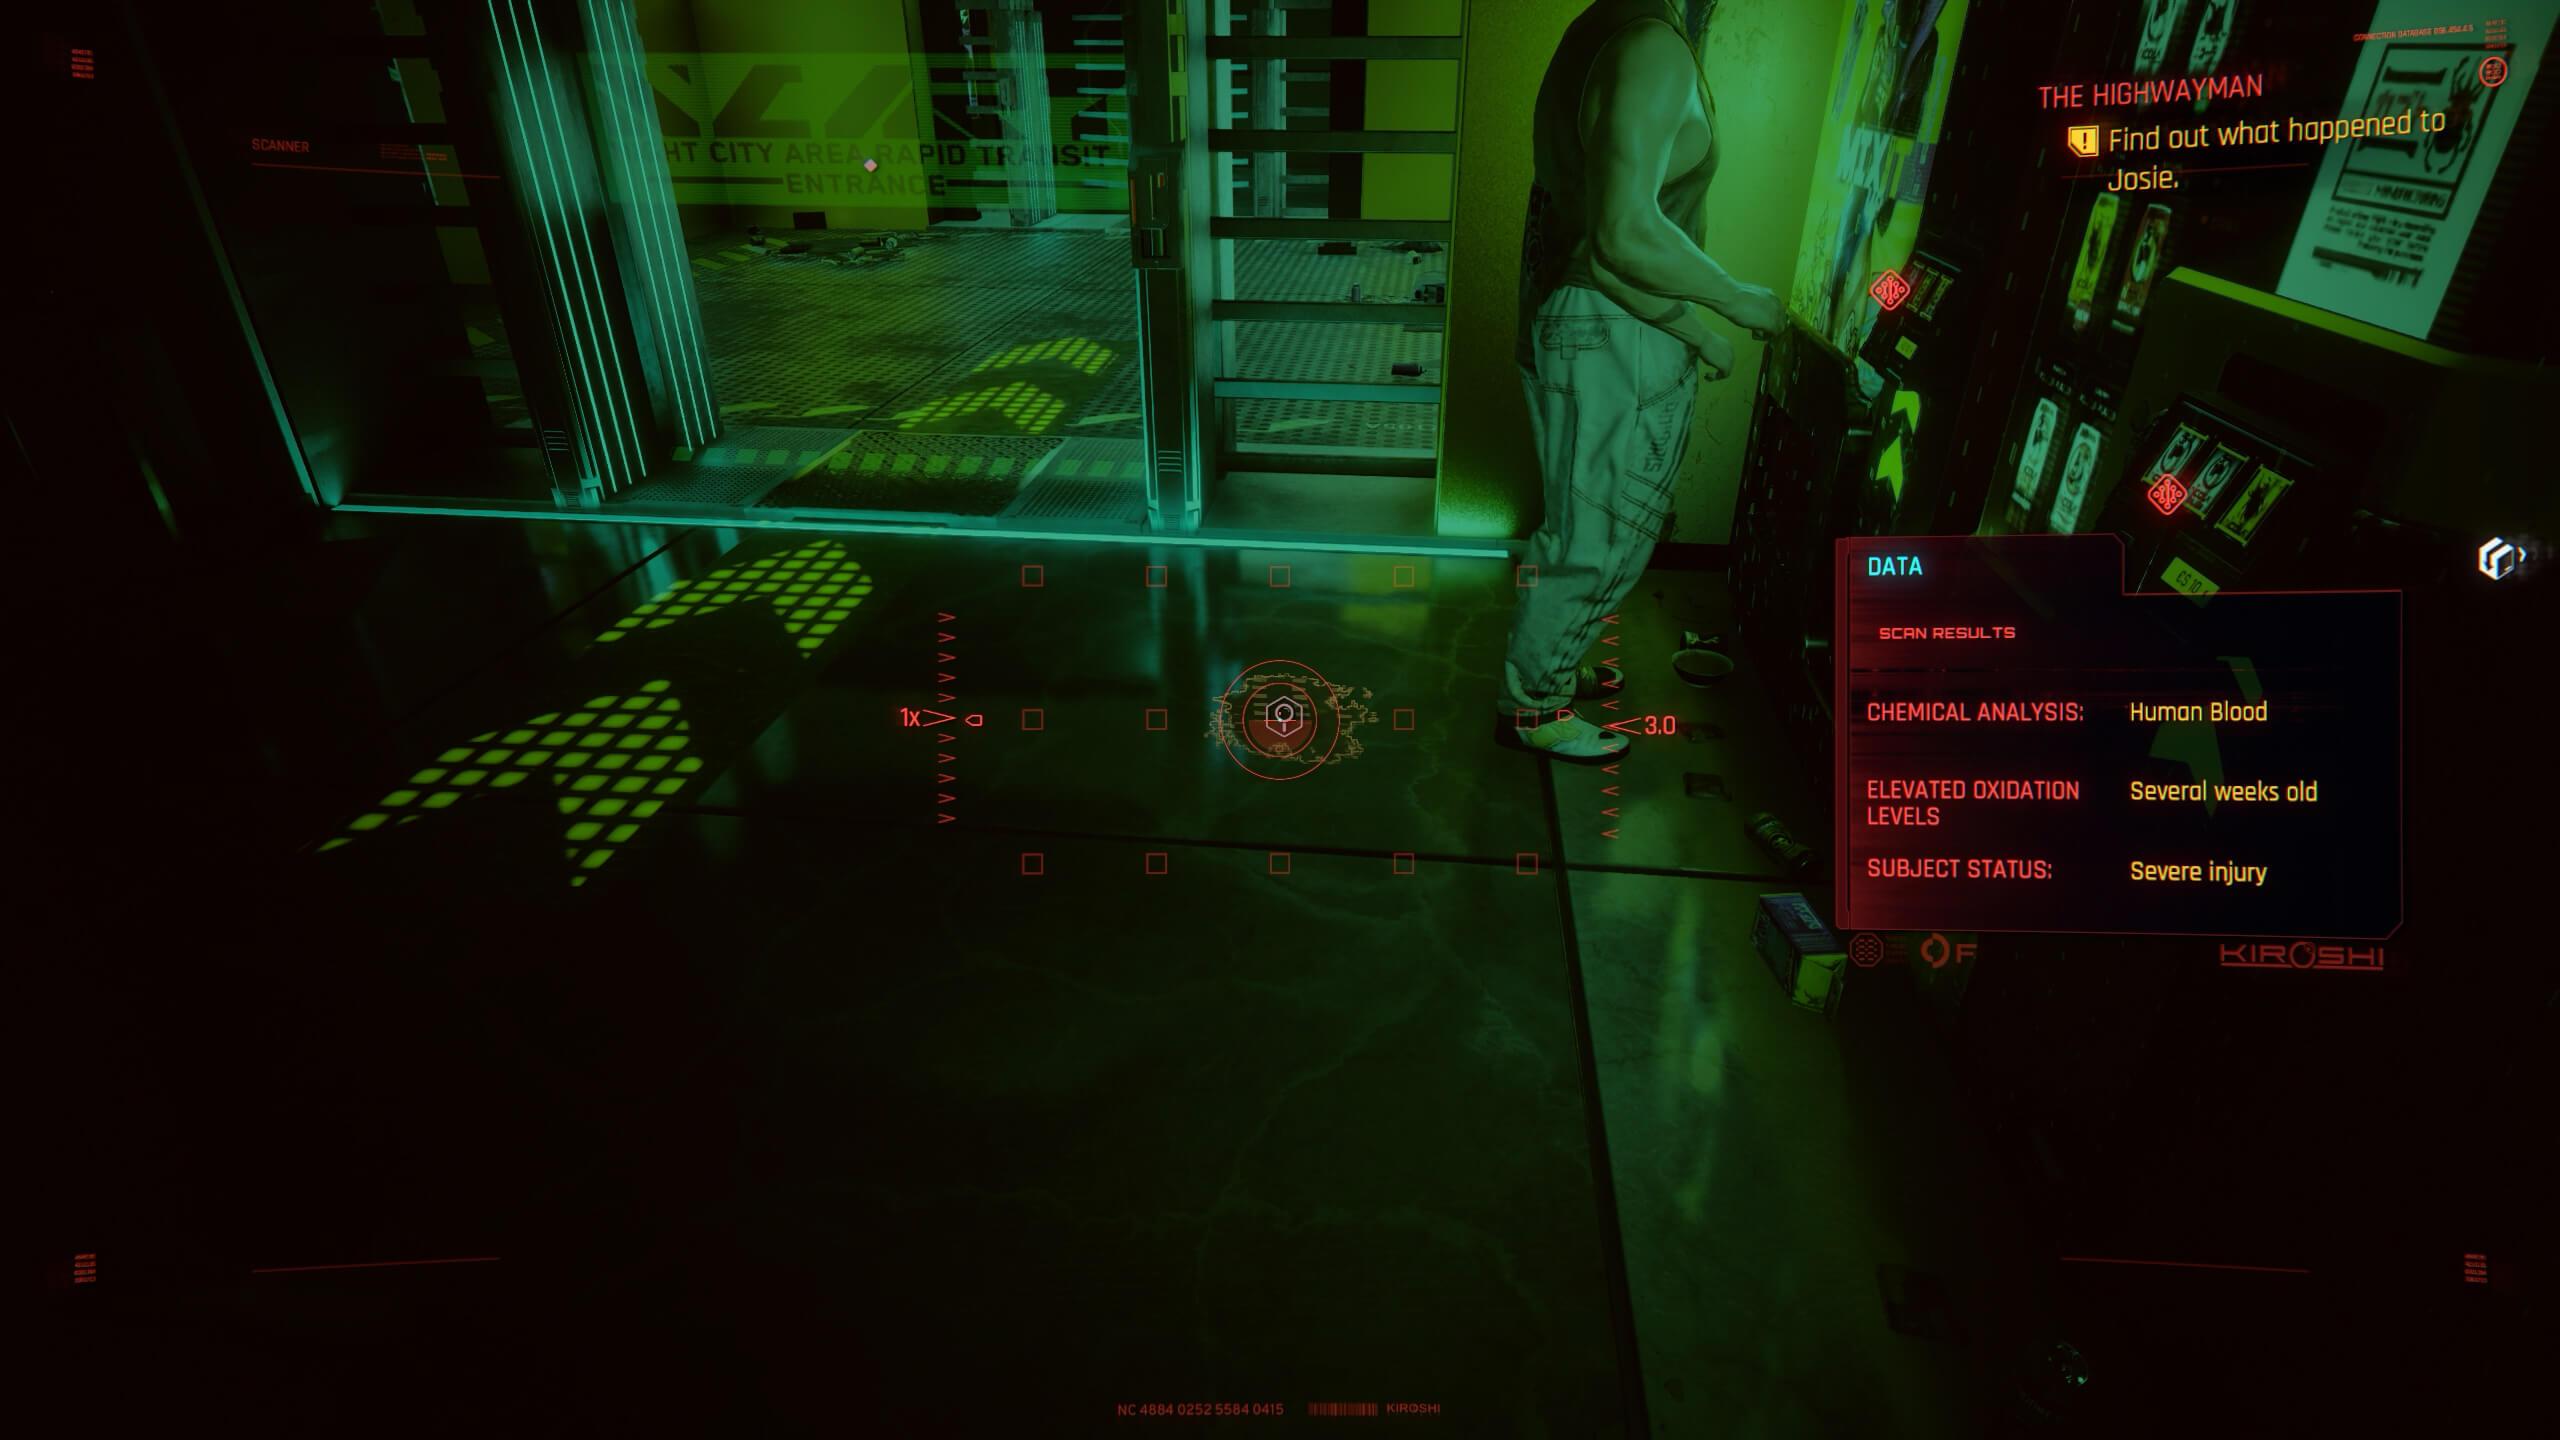 Blood trail - The Highwayman - Cyberpunk 2077